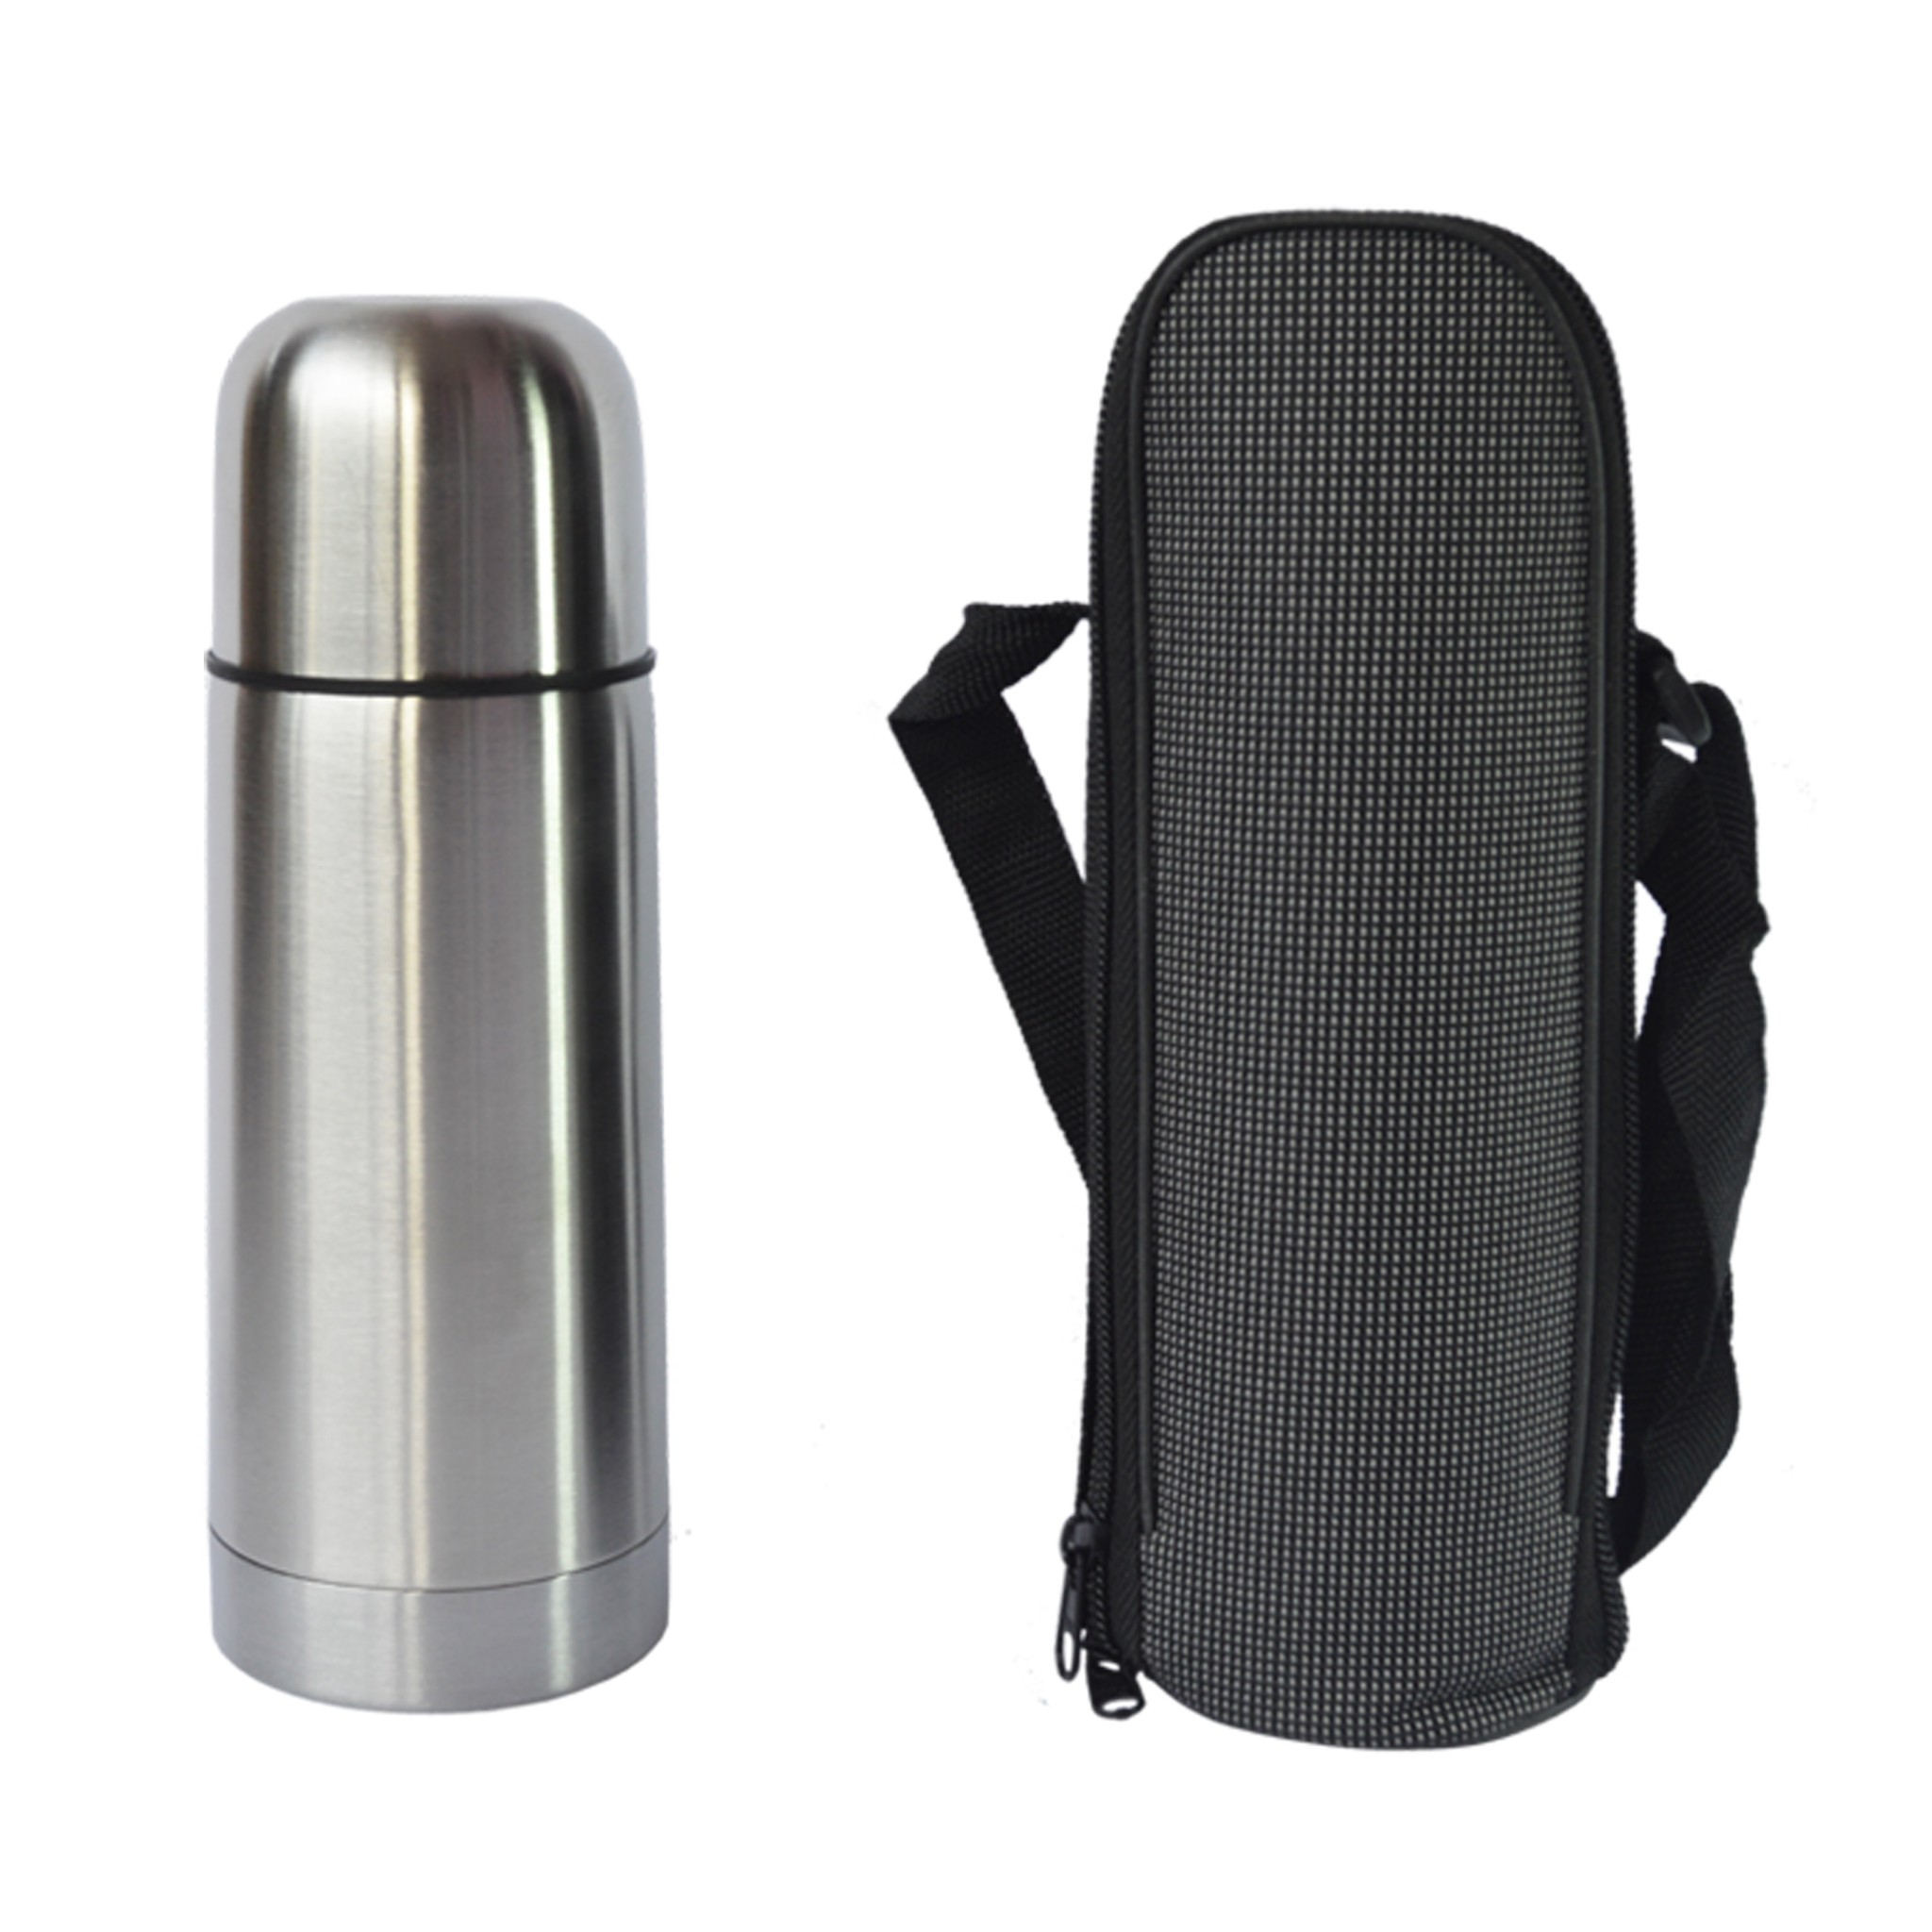 Harga Jual Botol Plastik Minuman 500 Ml Termos Stainless Polos Free Tas